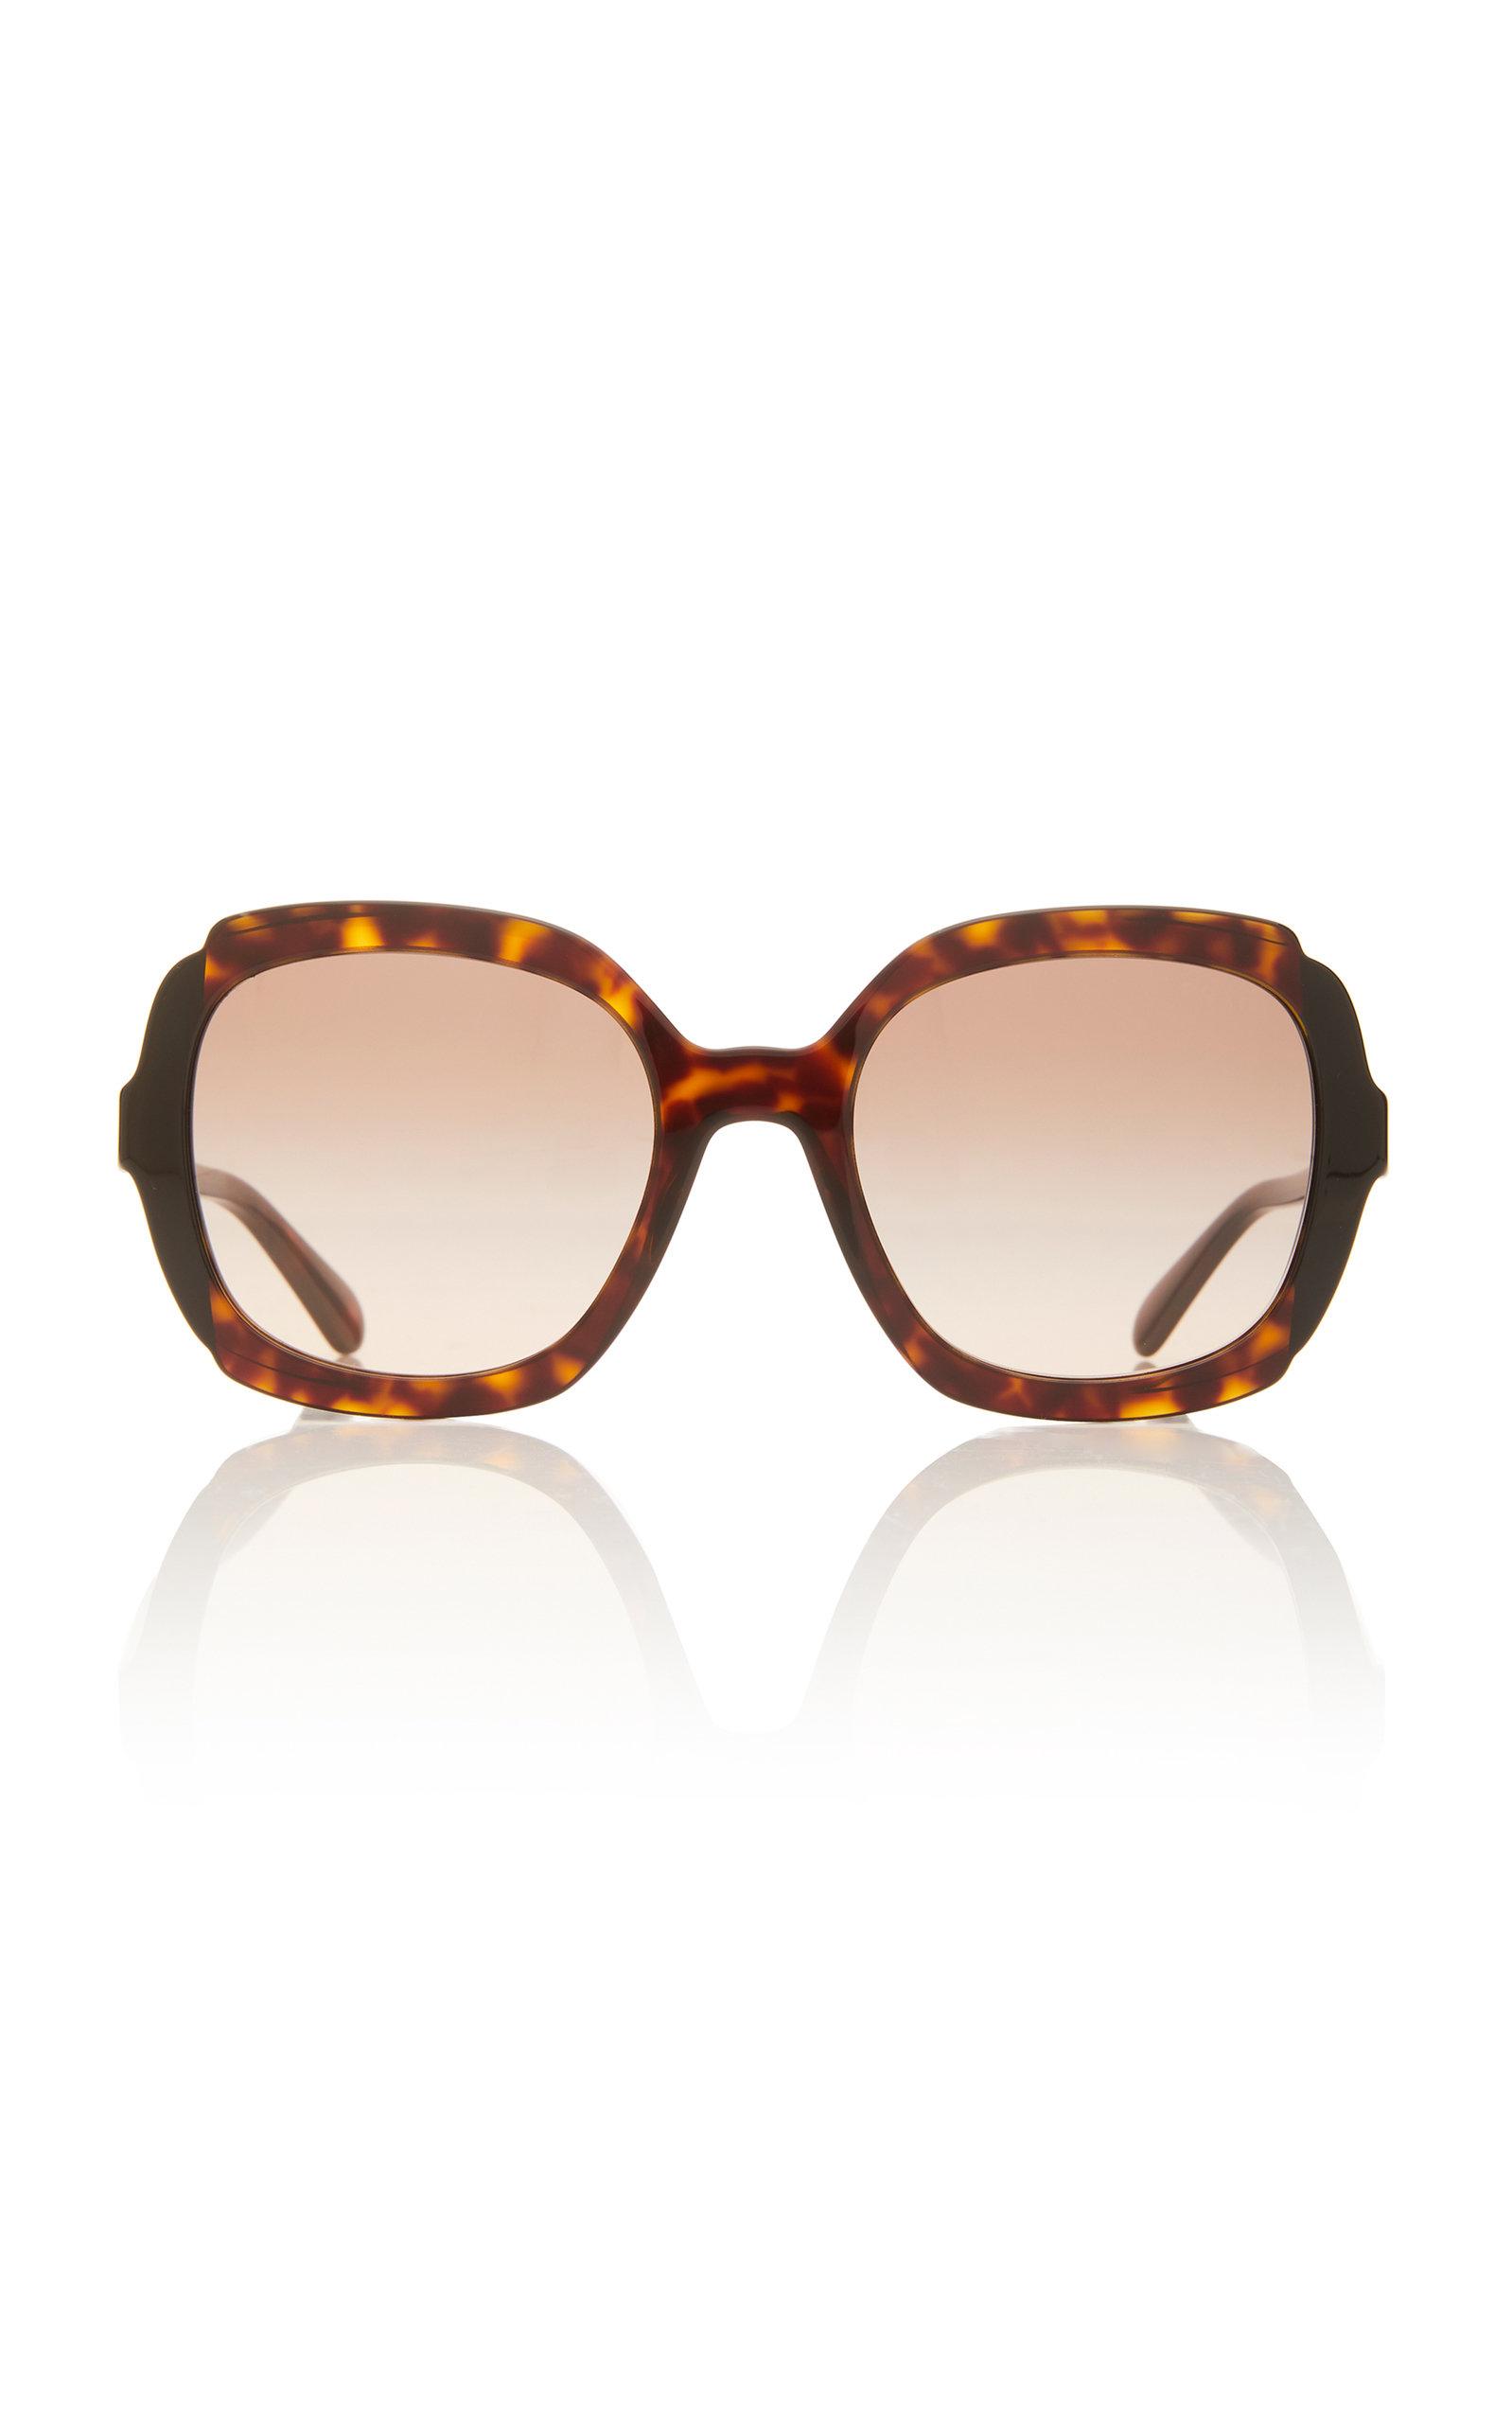 aa8eb9fdcb28 Round-Frame Acetate Sunglasses by Prada | Moda Operandi